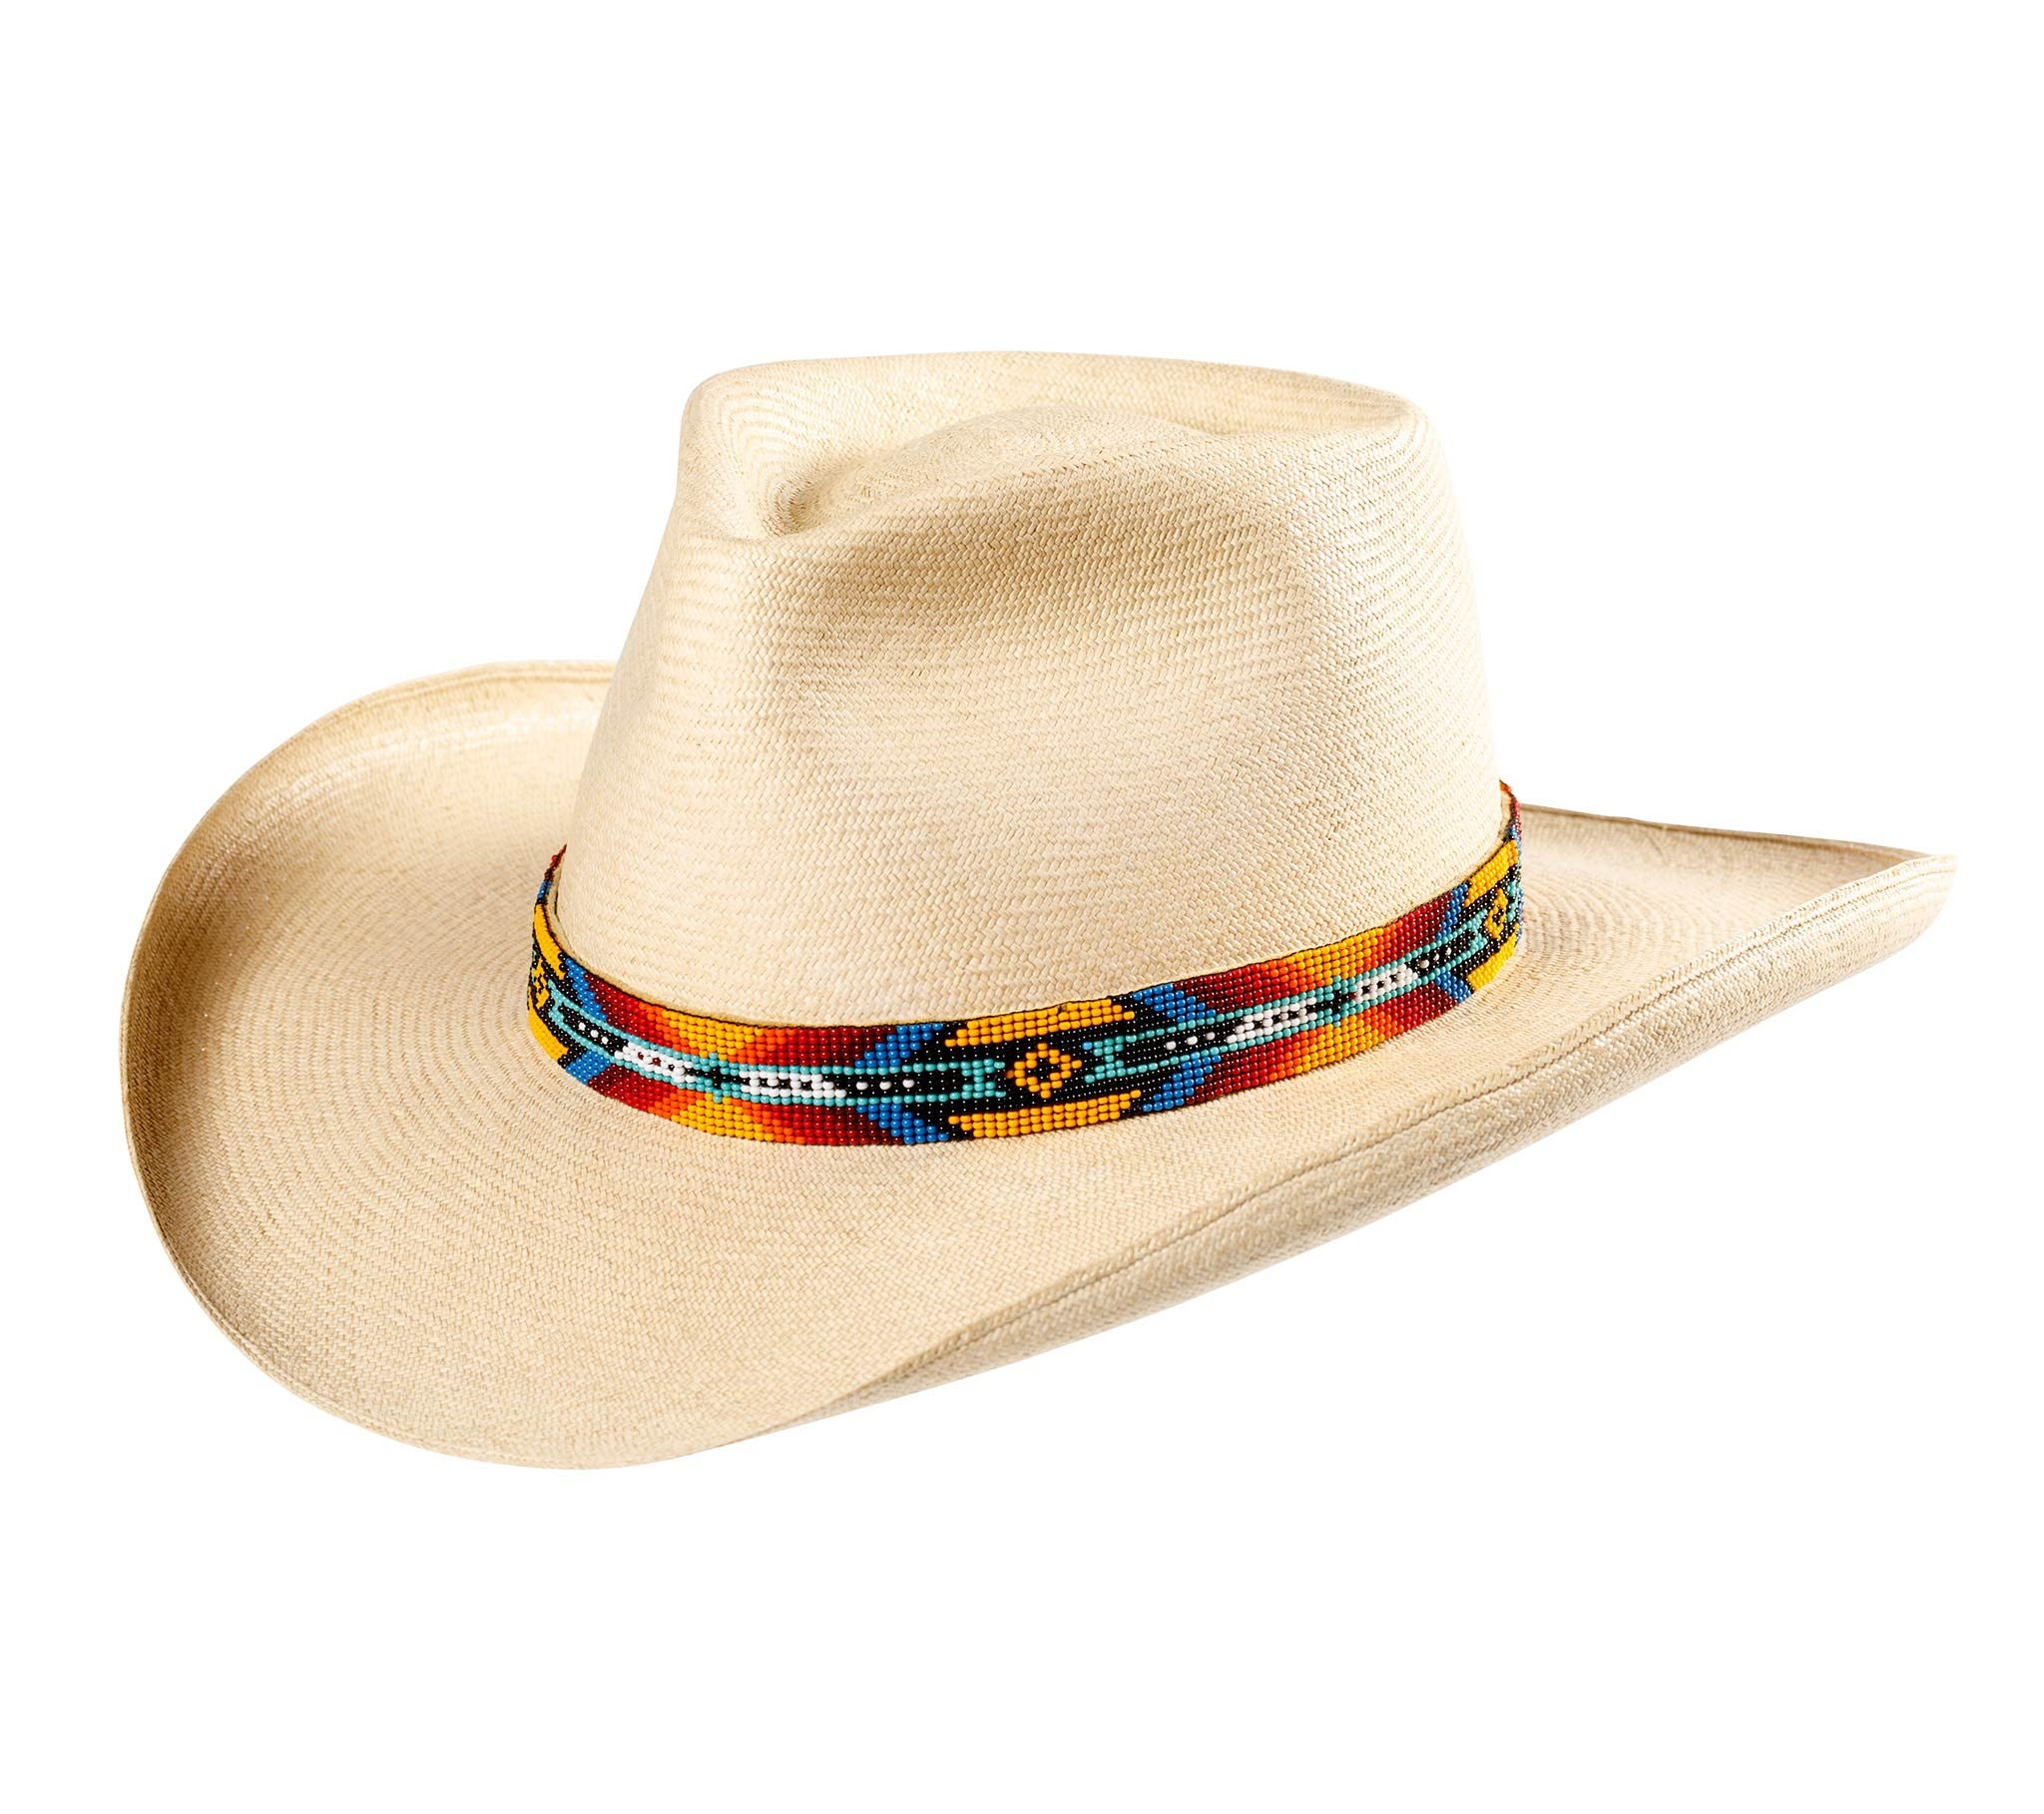 Tycoon Panama Hat